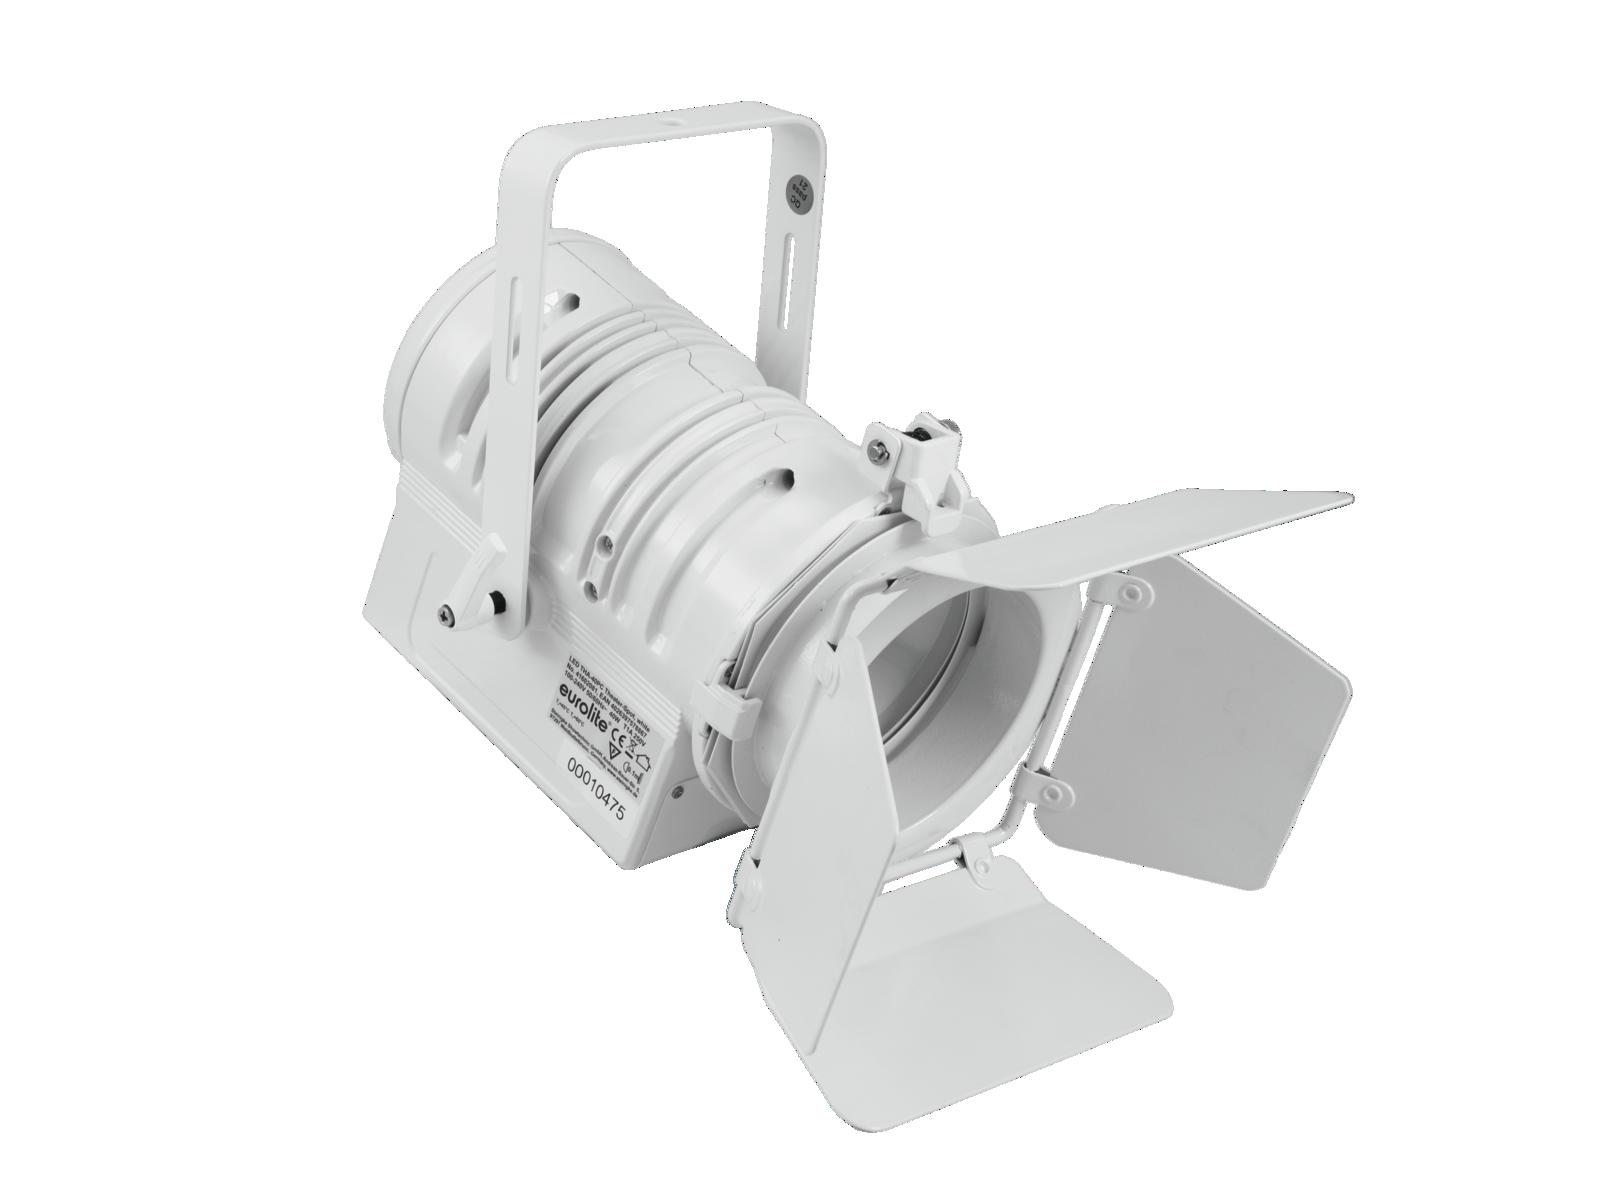 Eurolite LED THA-40PC divadelní reflektor, bílý